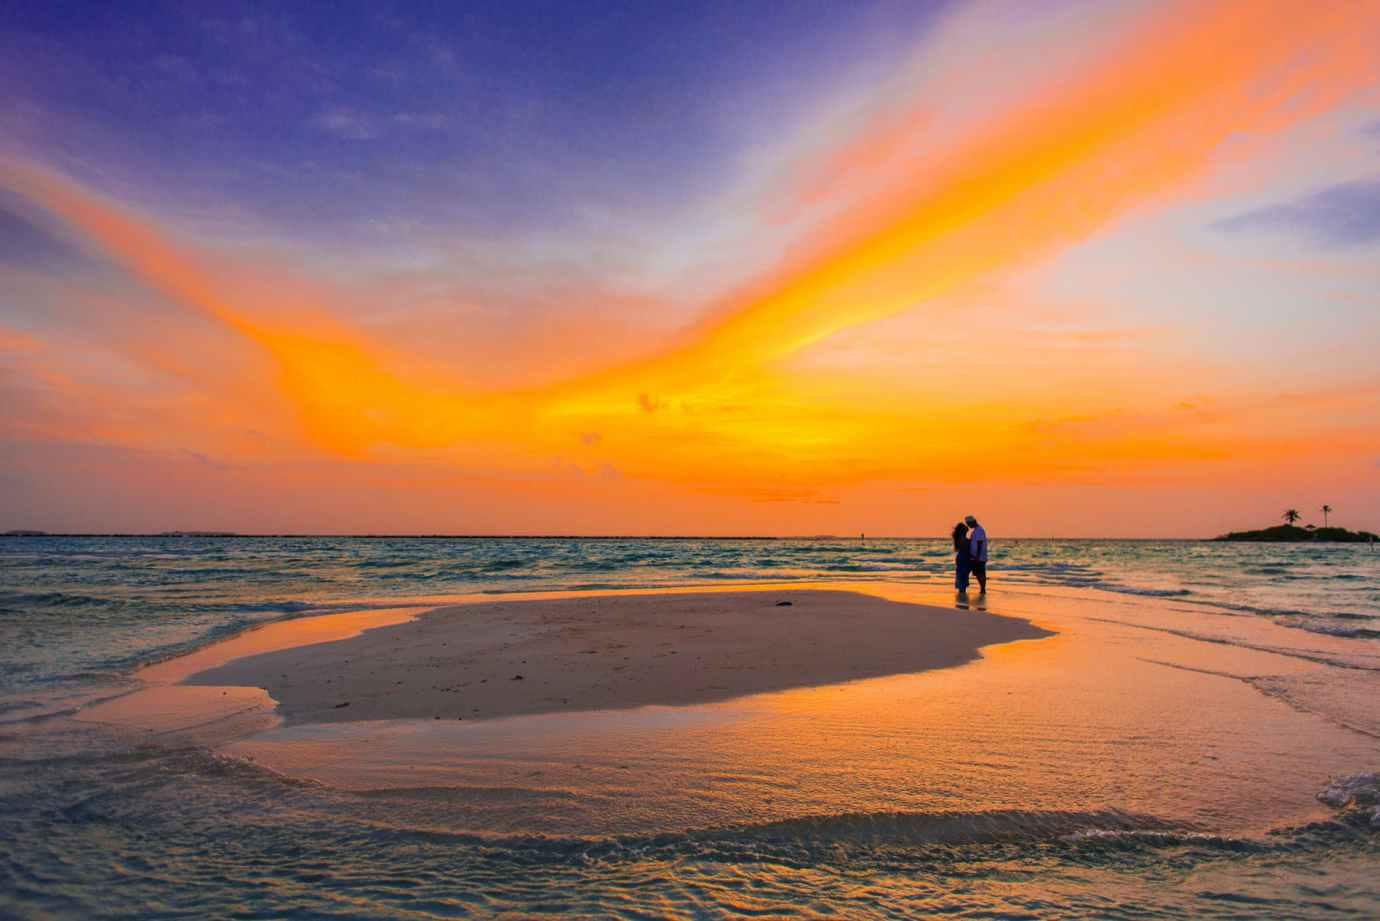 two people standing near seashore